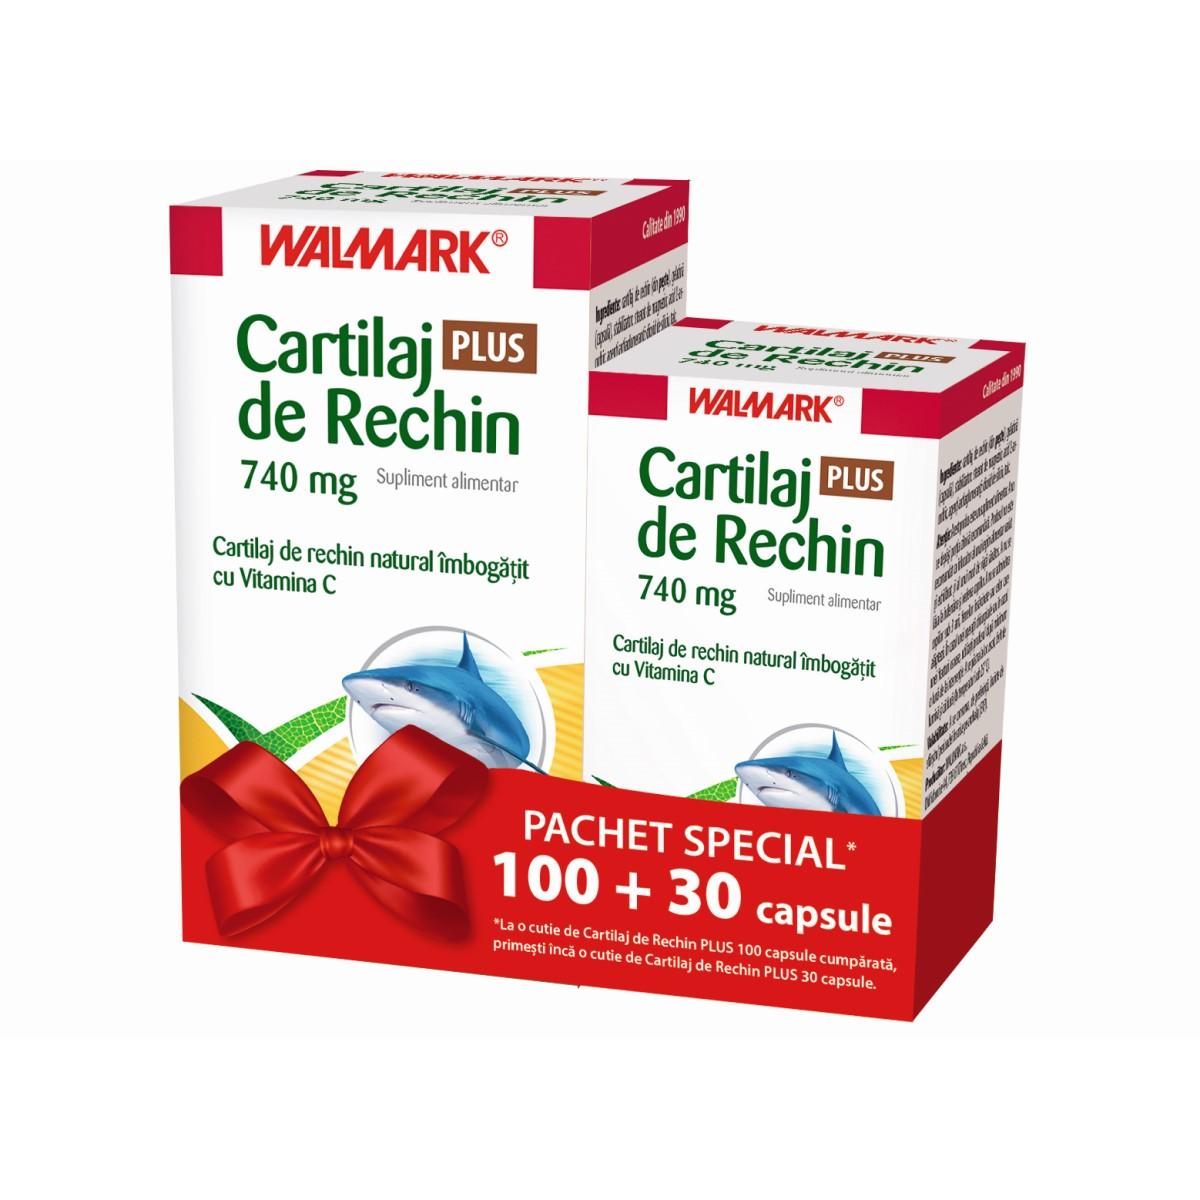 Walmark Cartilaj de Rechin, comprimate | Catena | Preturi mici!